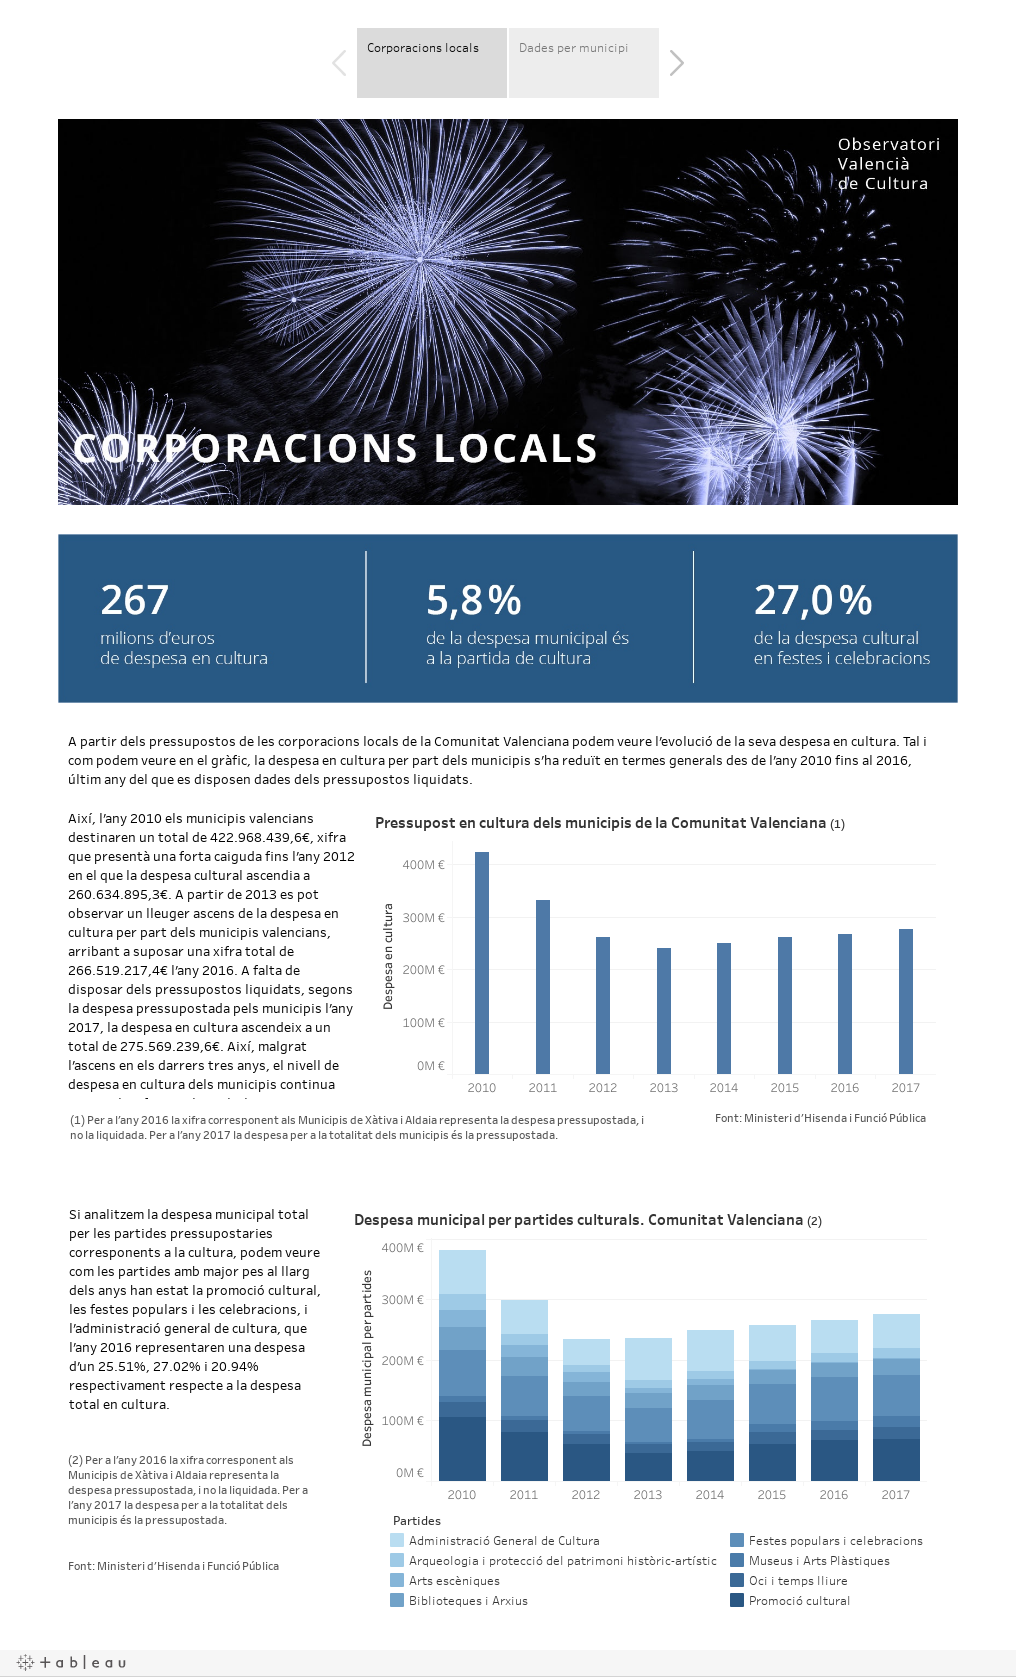 Corporacions locals